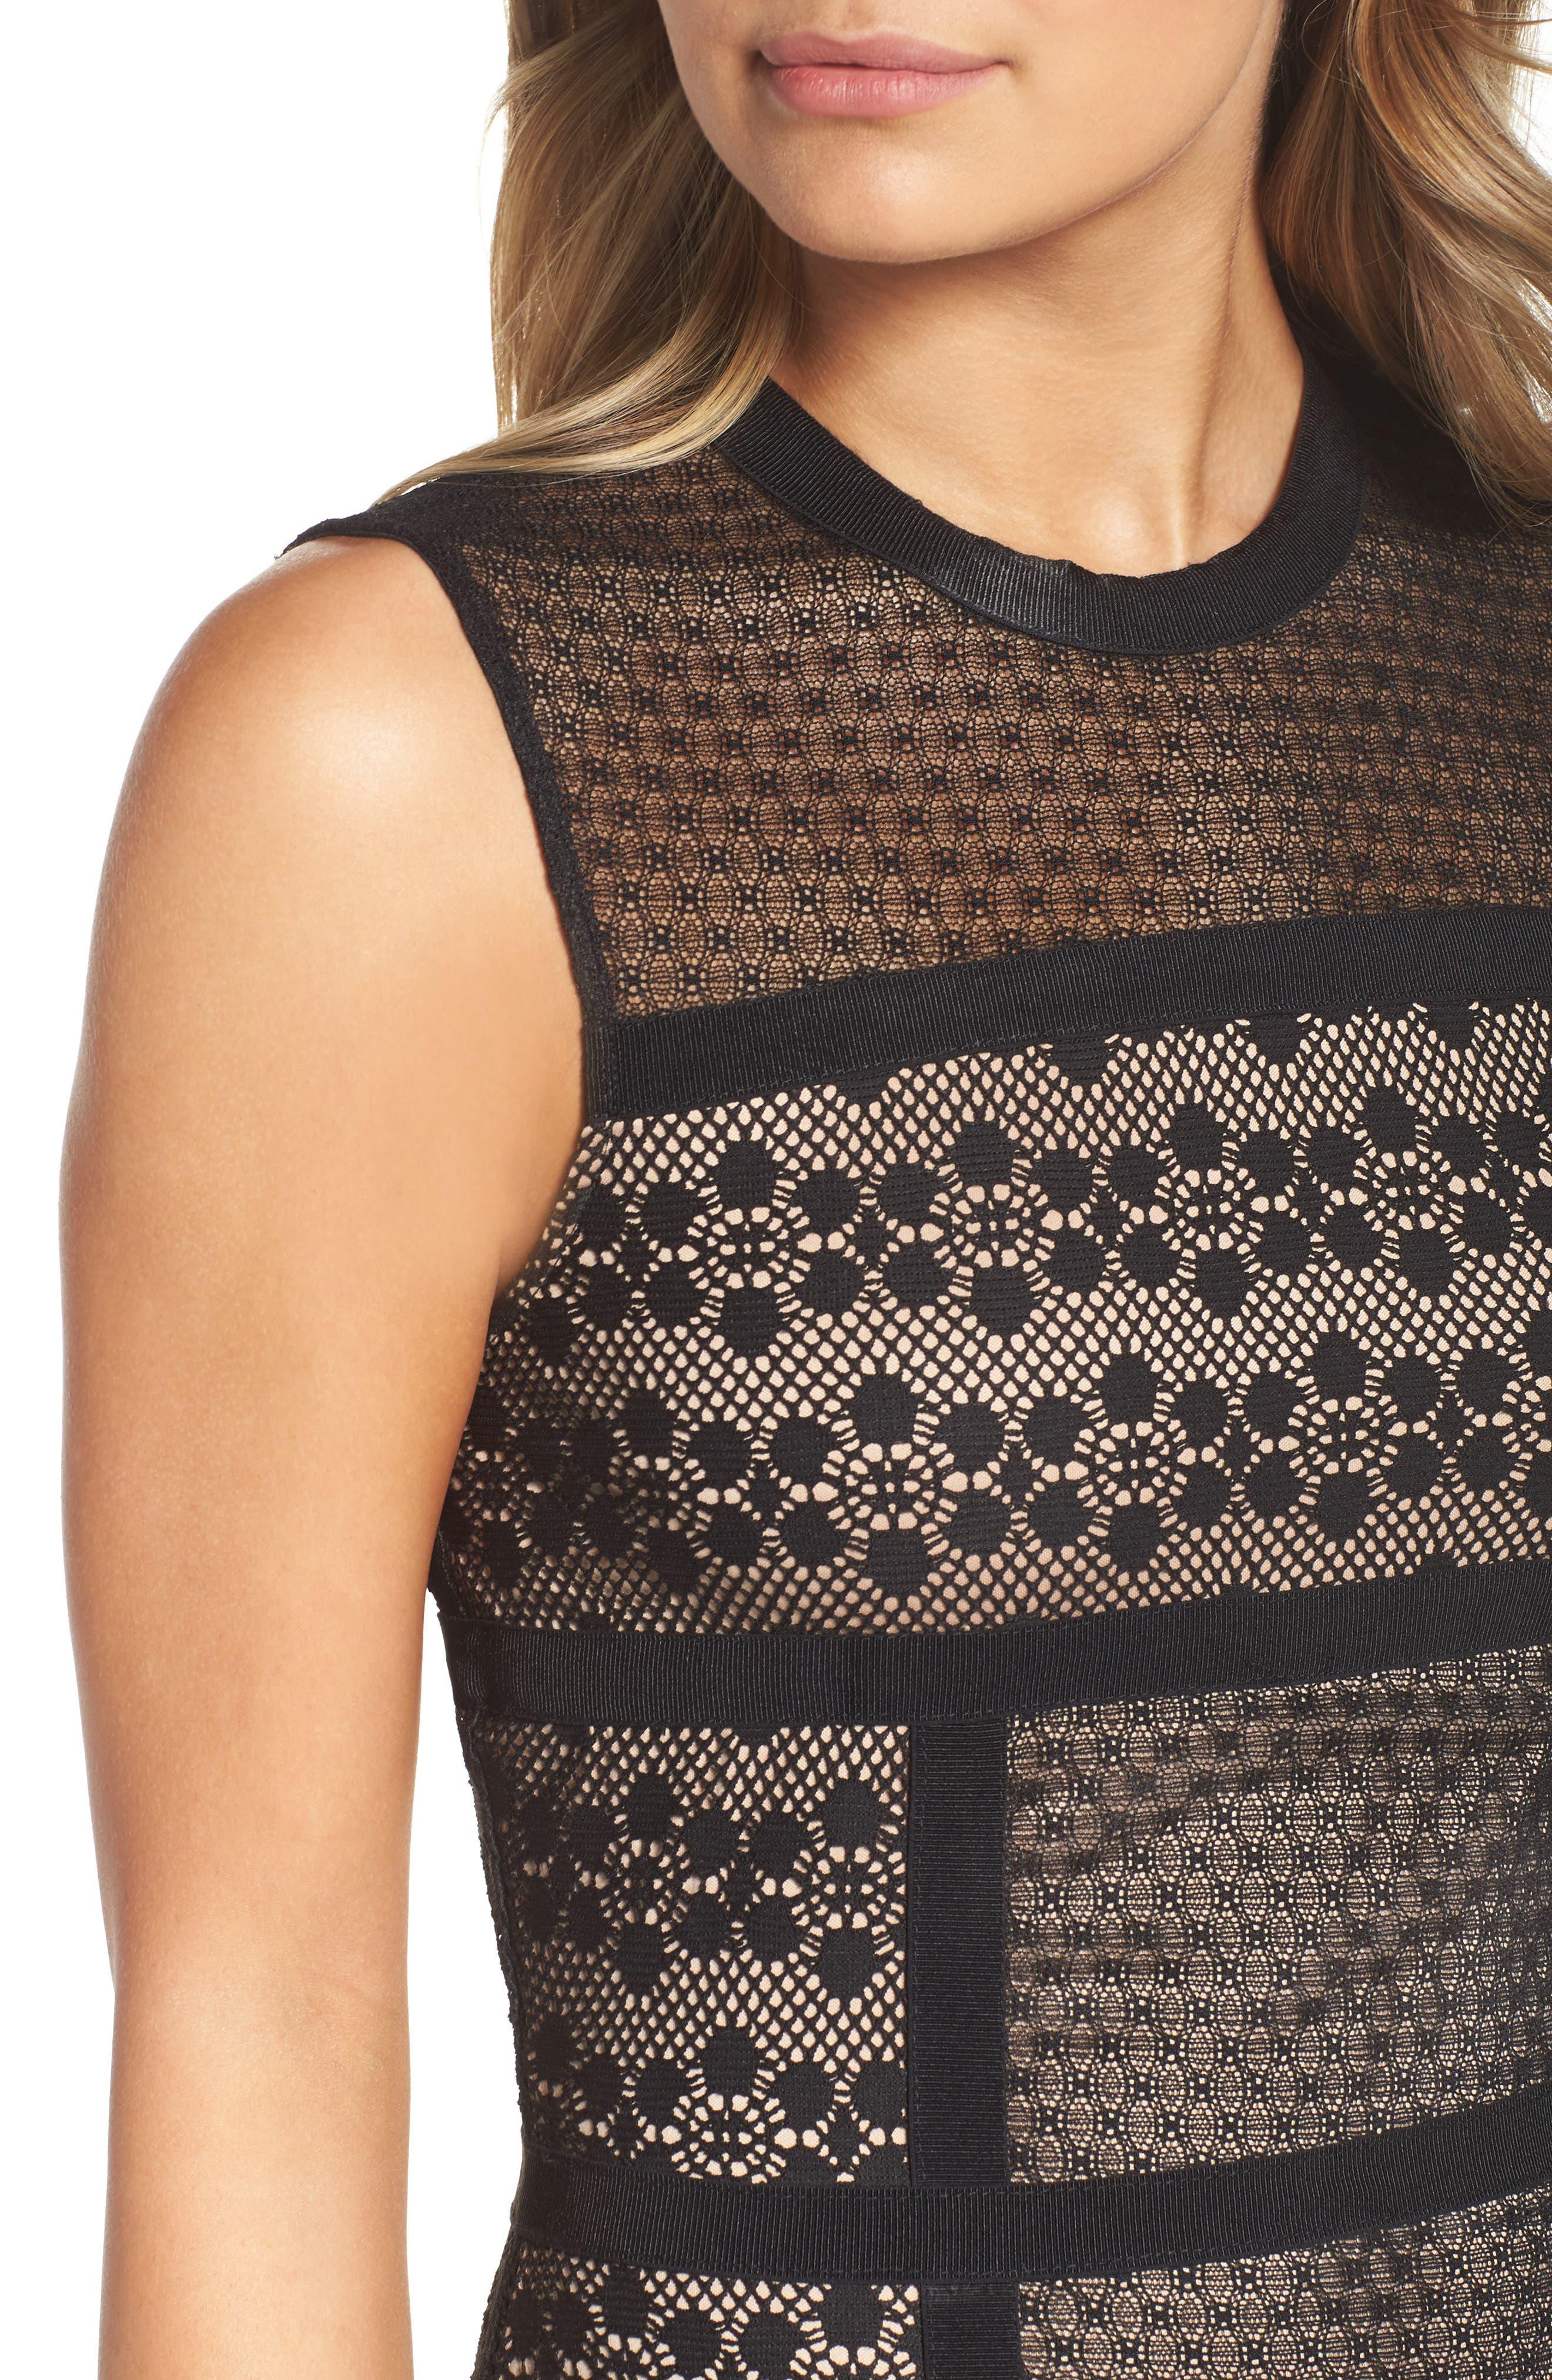 Hola Mamacita Body-Con Dress,                             Alternate thumbnail 5, color,                             Black